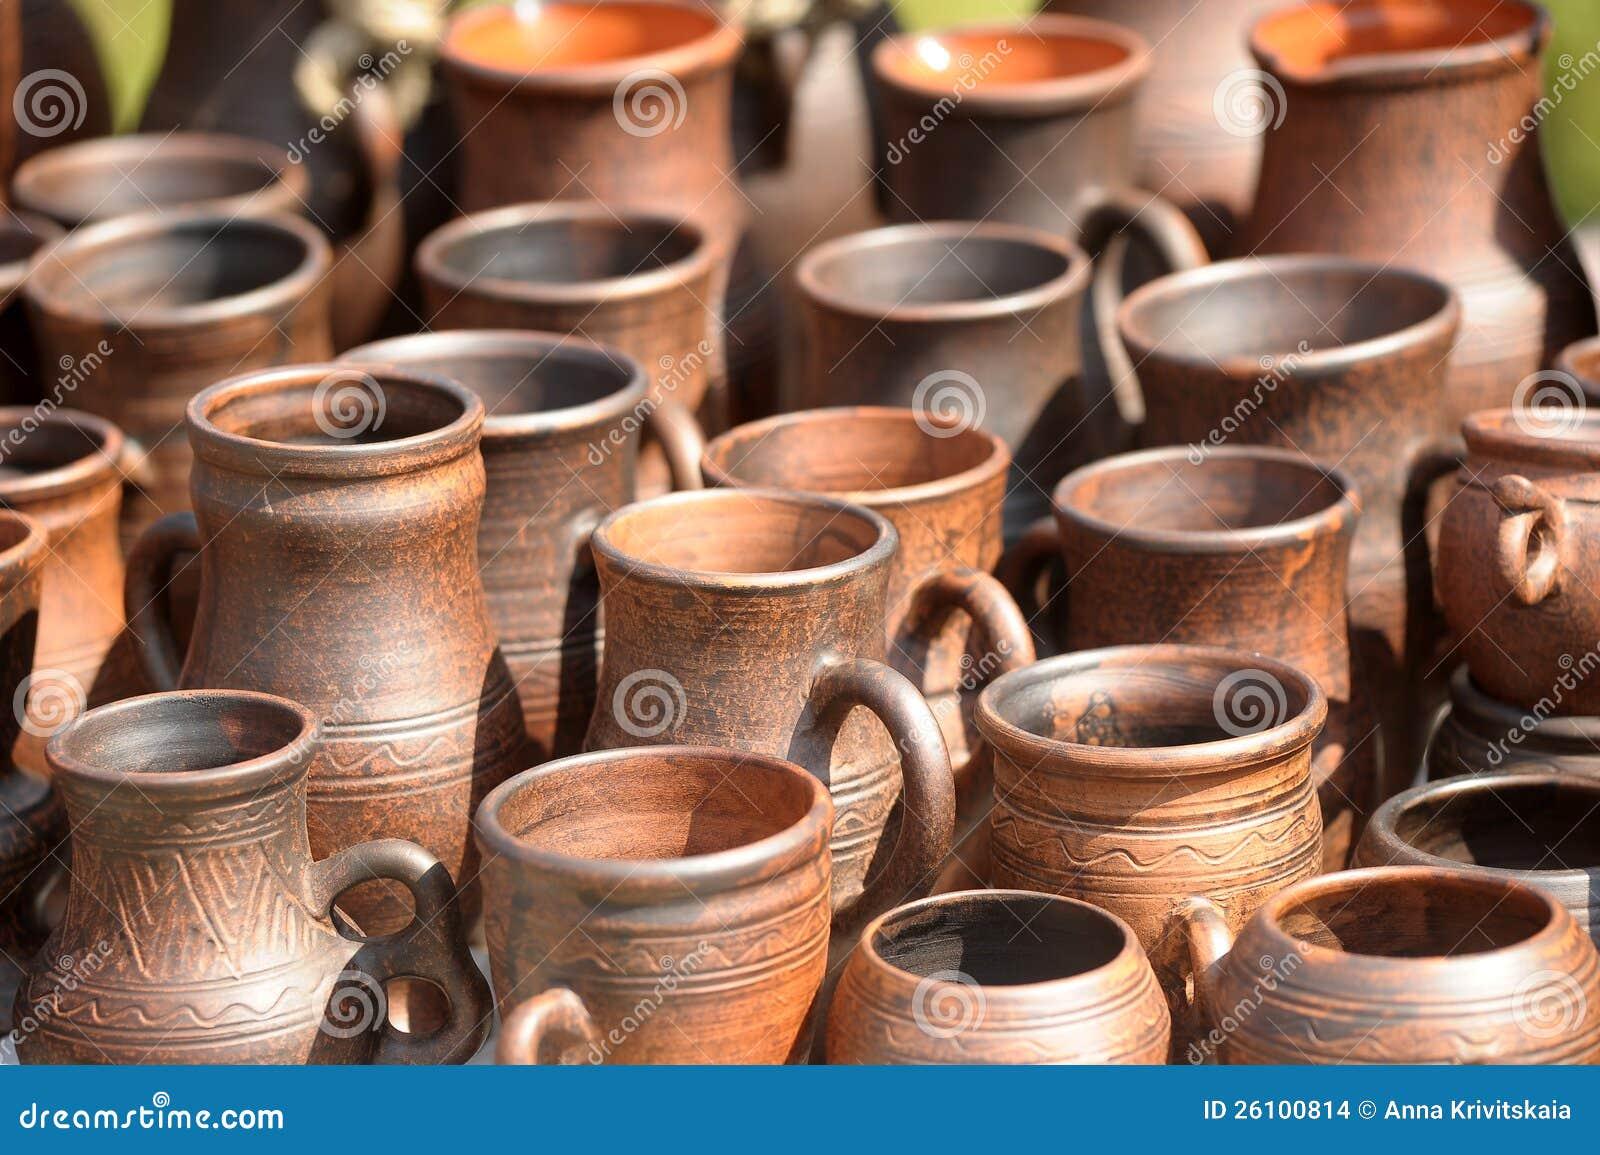 Download Ceramic jugs stock photo. Image of decoration, crockery - 26100814